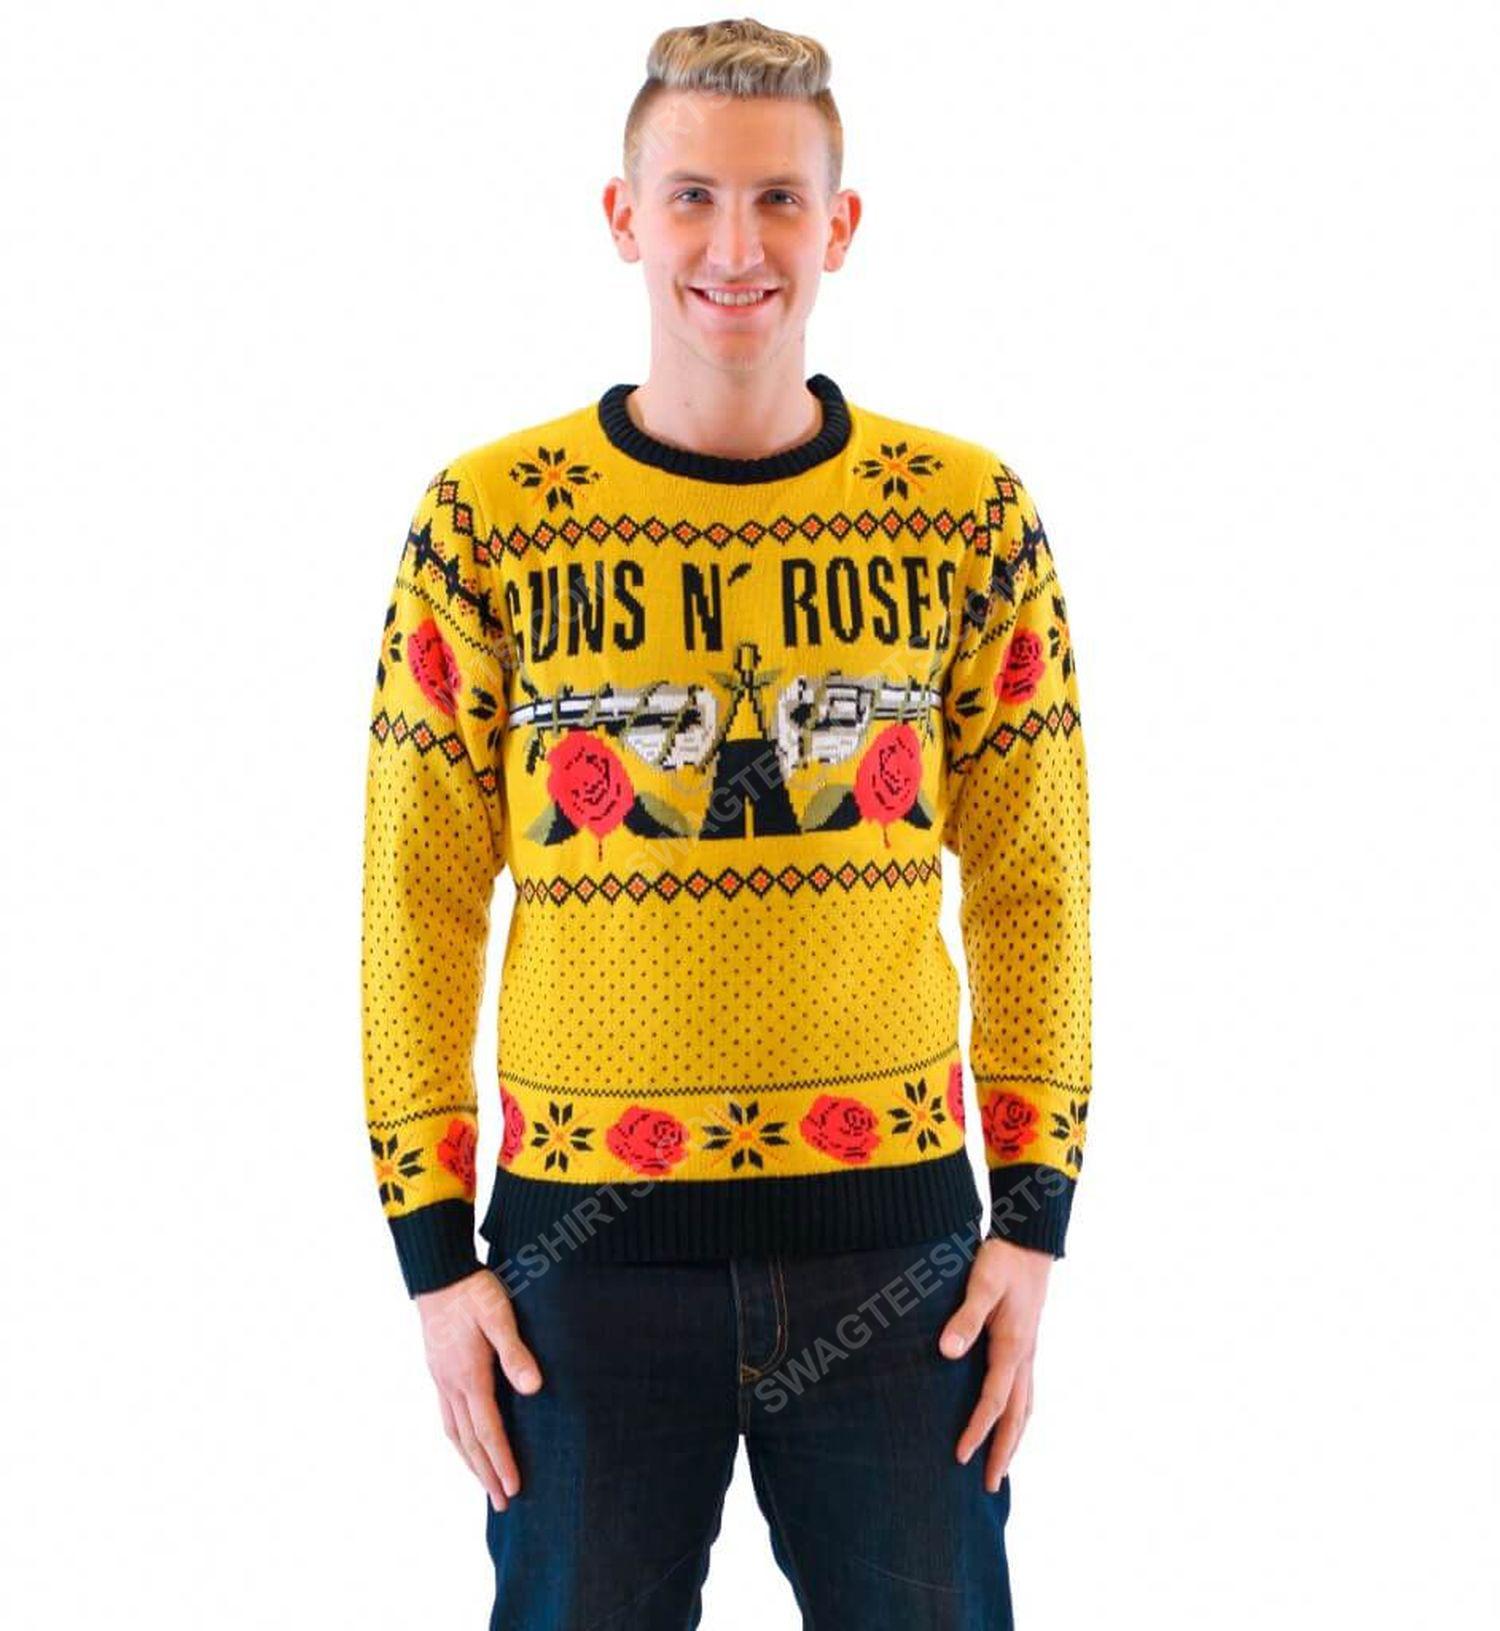 Guns n' roses rock band full print ugly christmas sweater 3